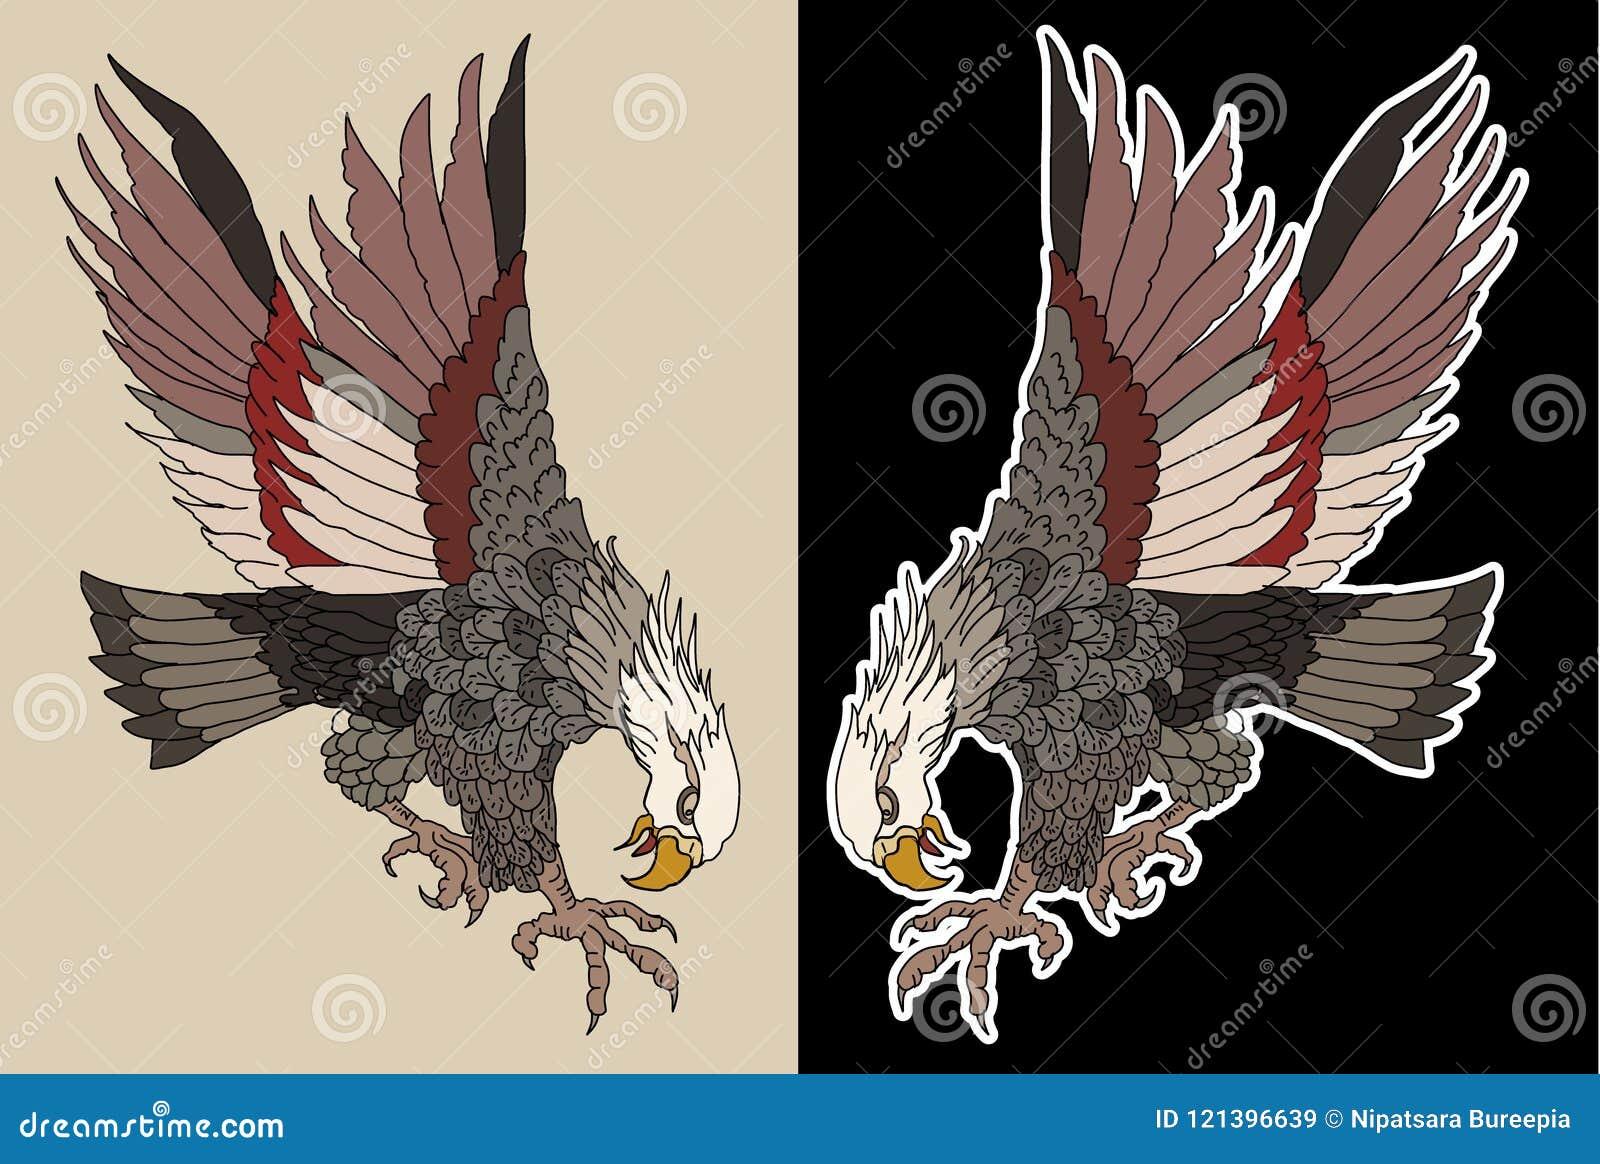 American Traditional Eagle Tattoo Design